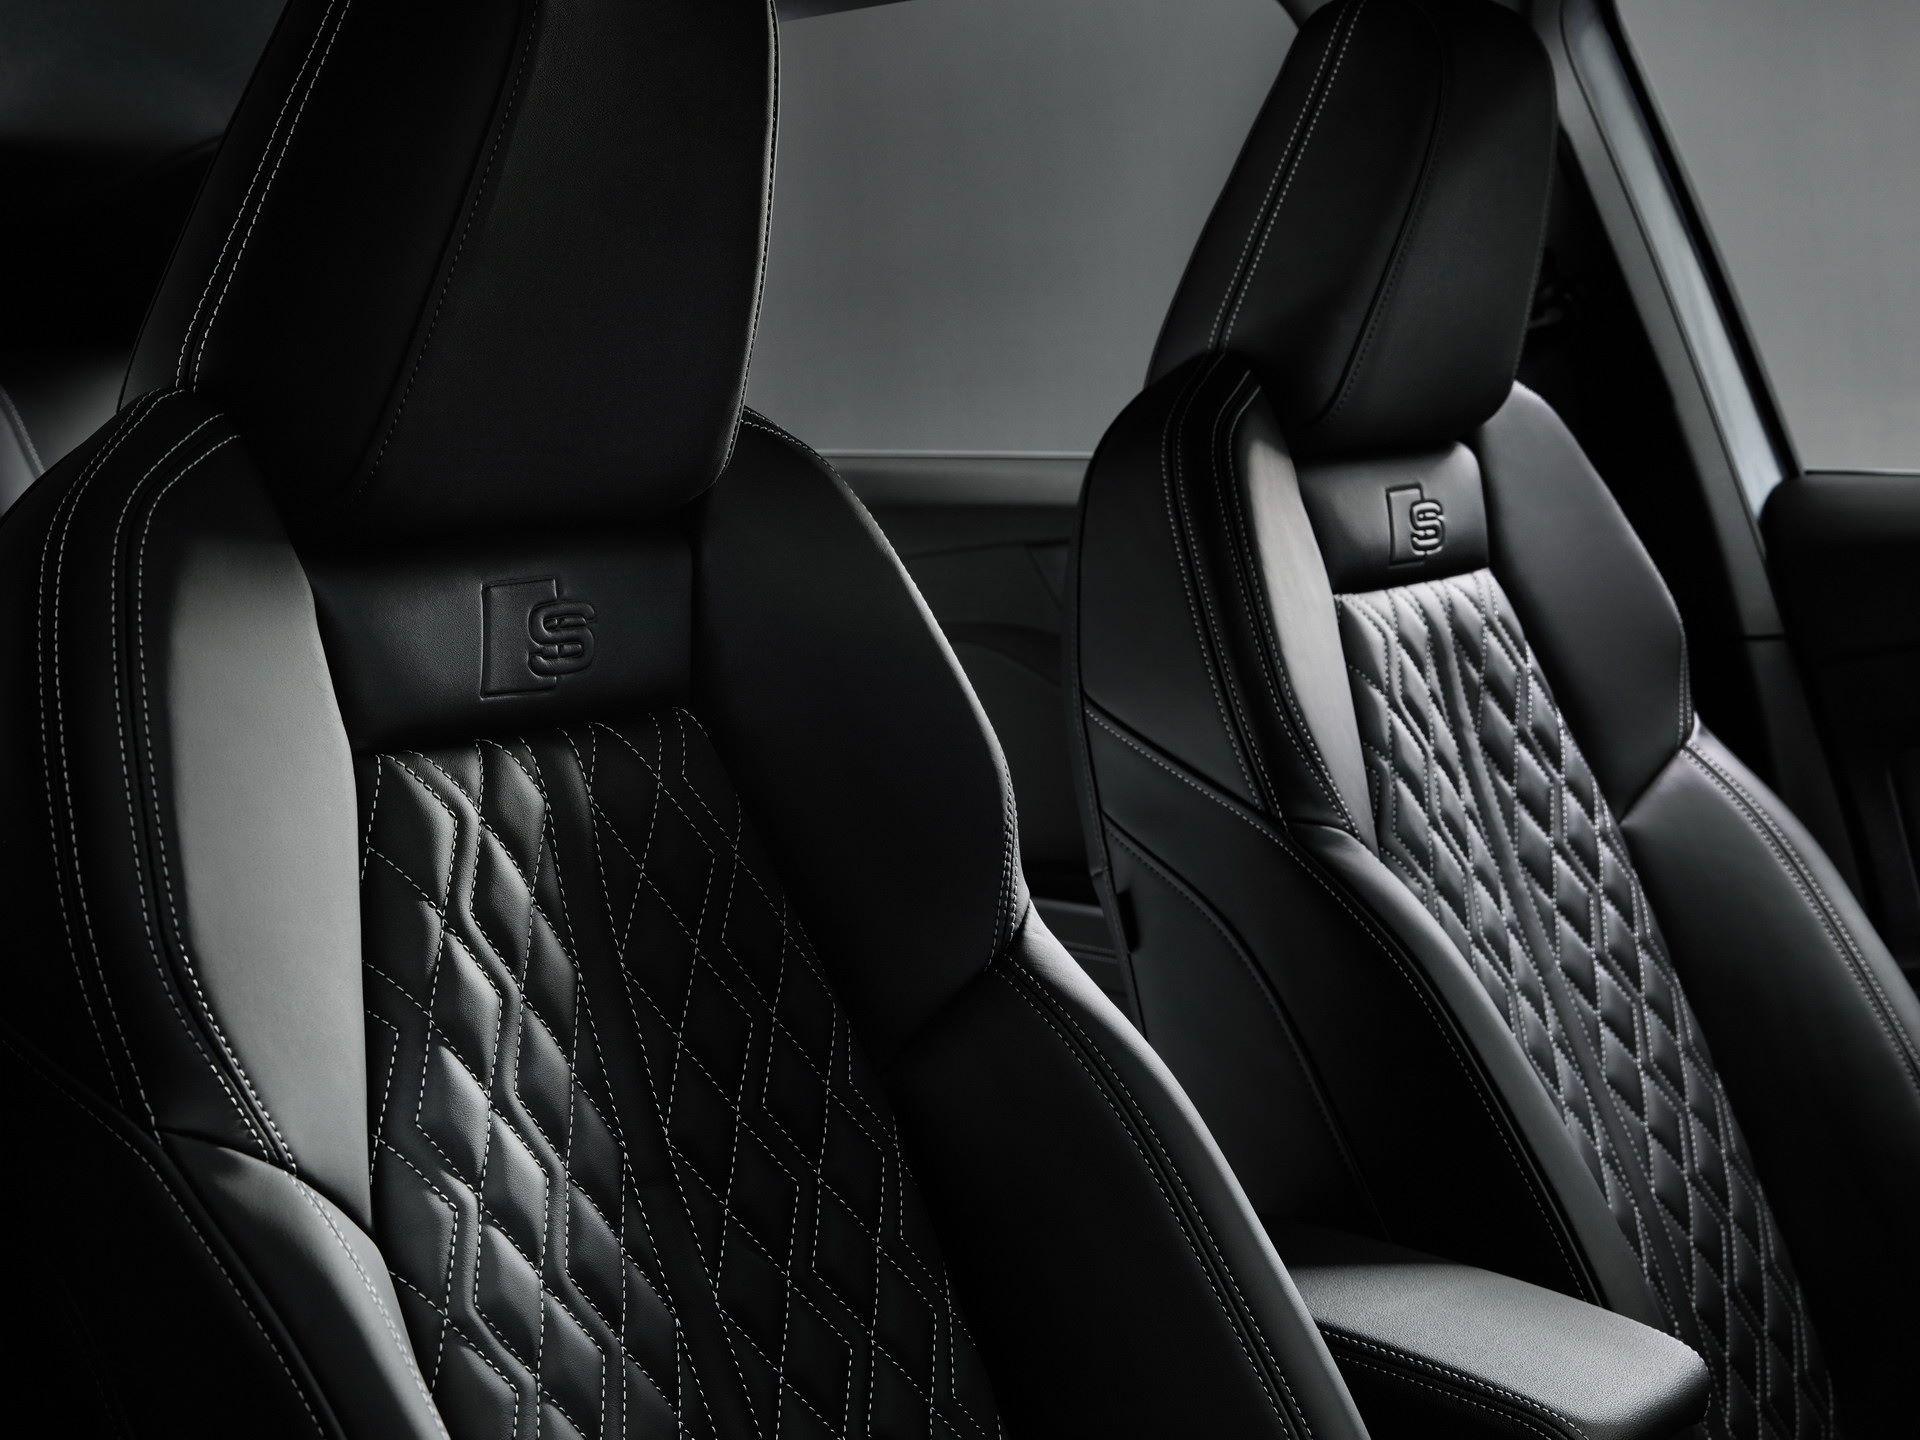 Audi-Q4-e-tron-and-Q4-e-tron-Sportback-96